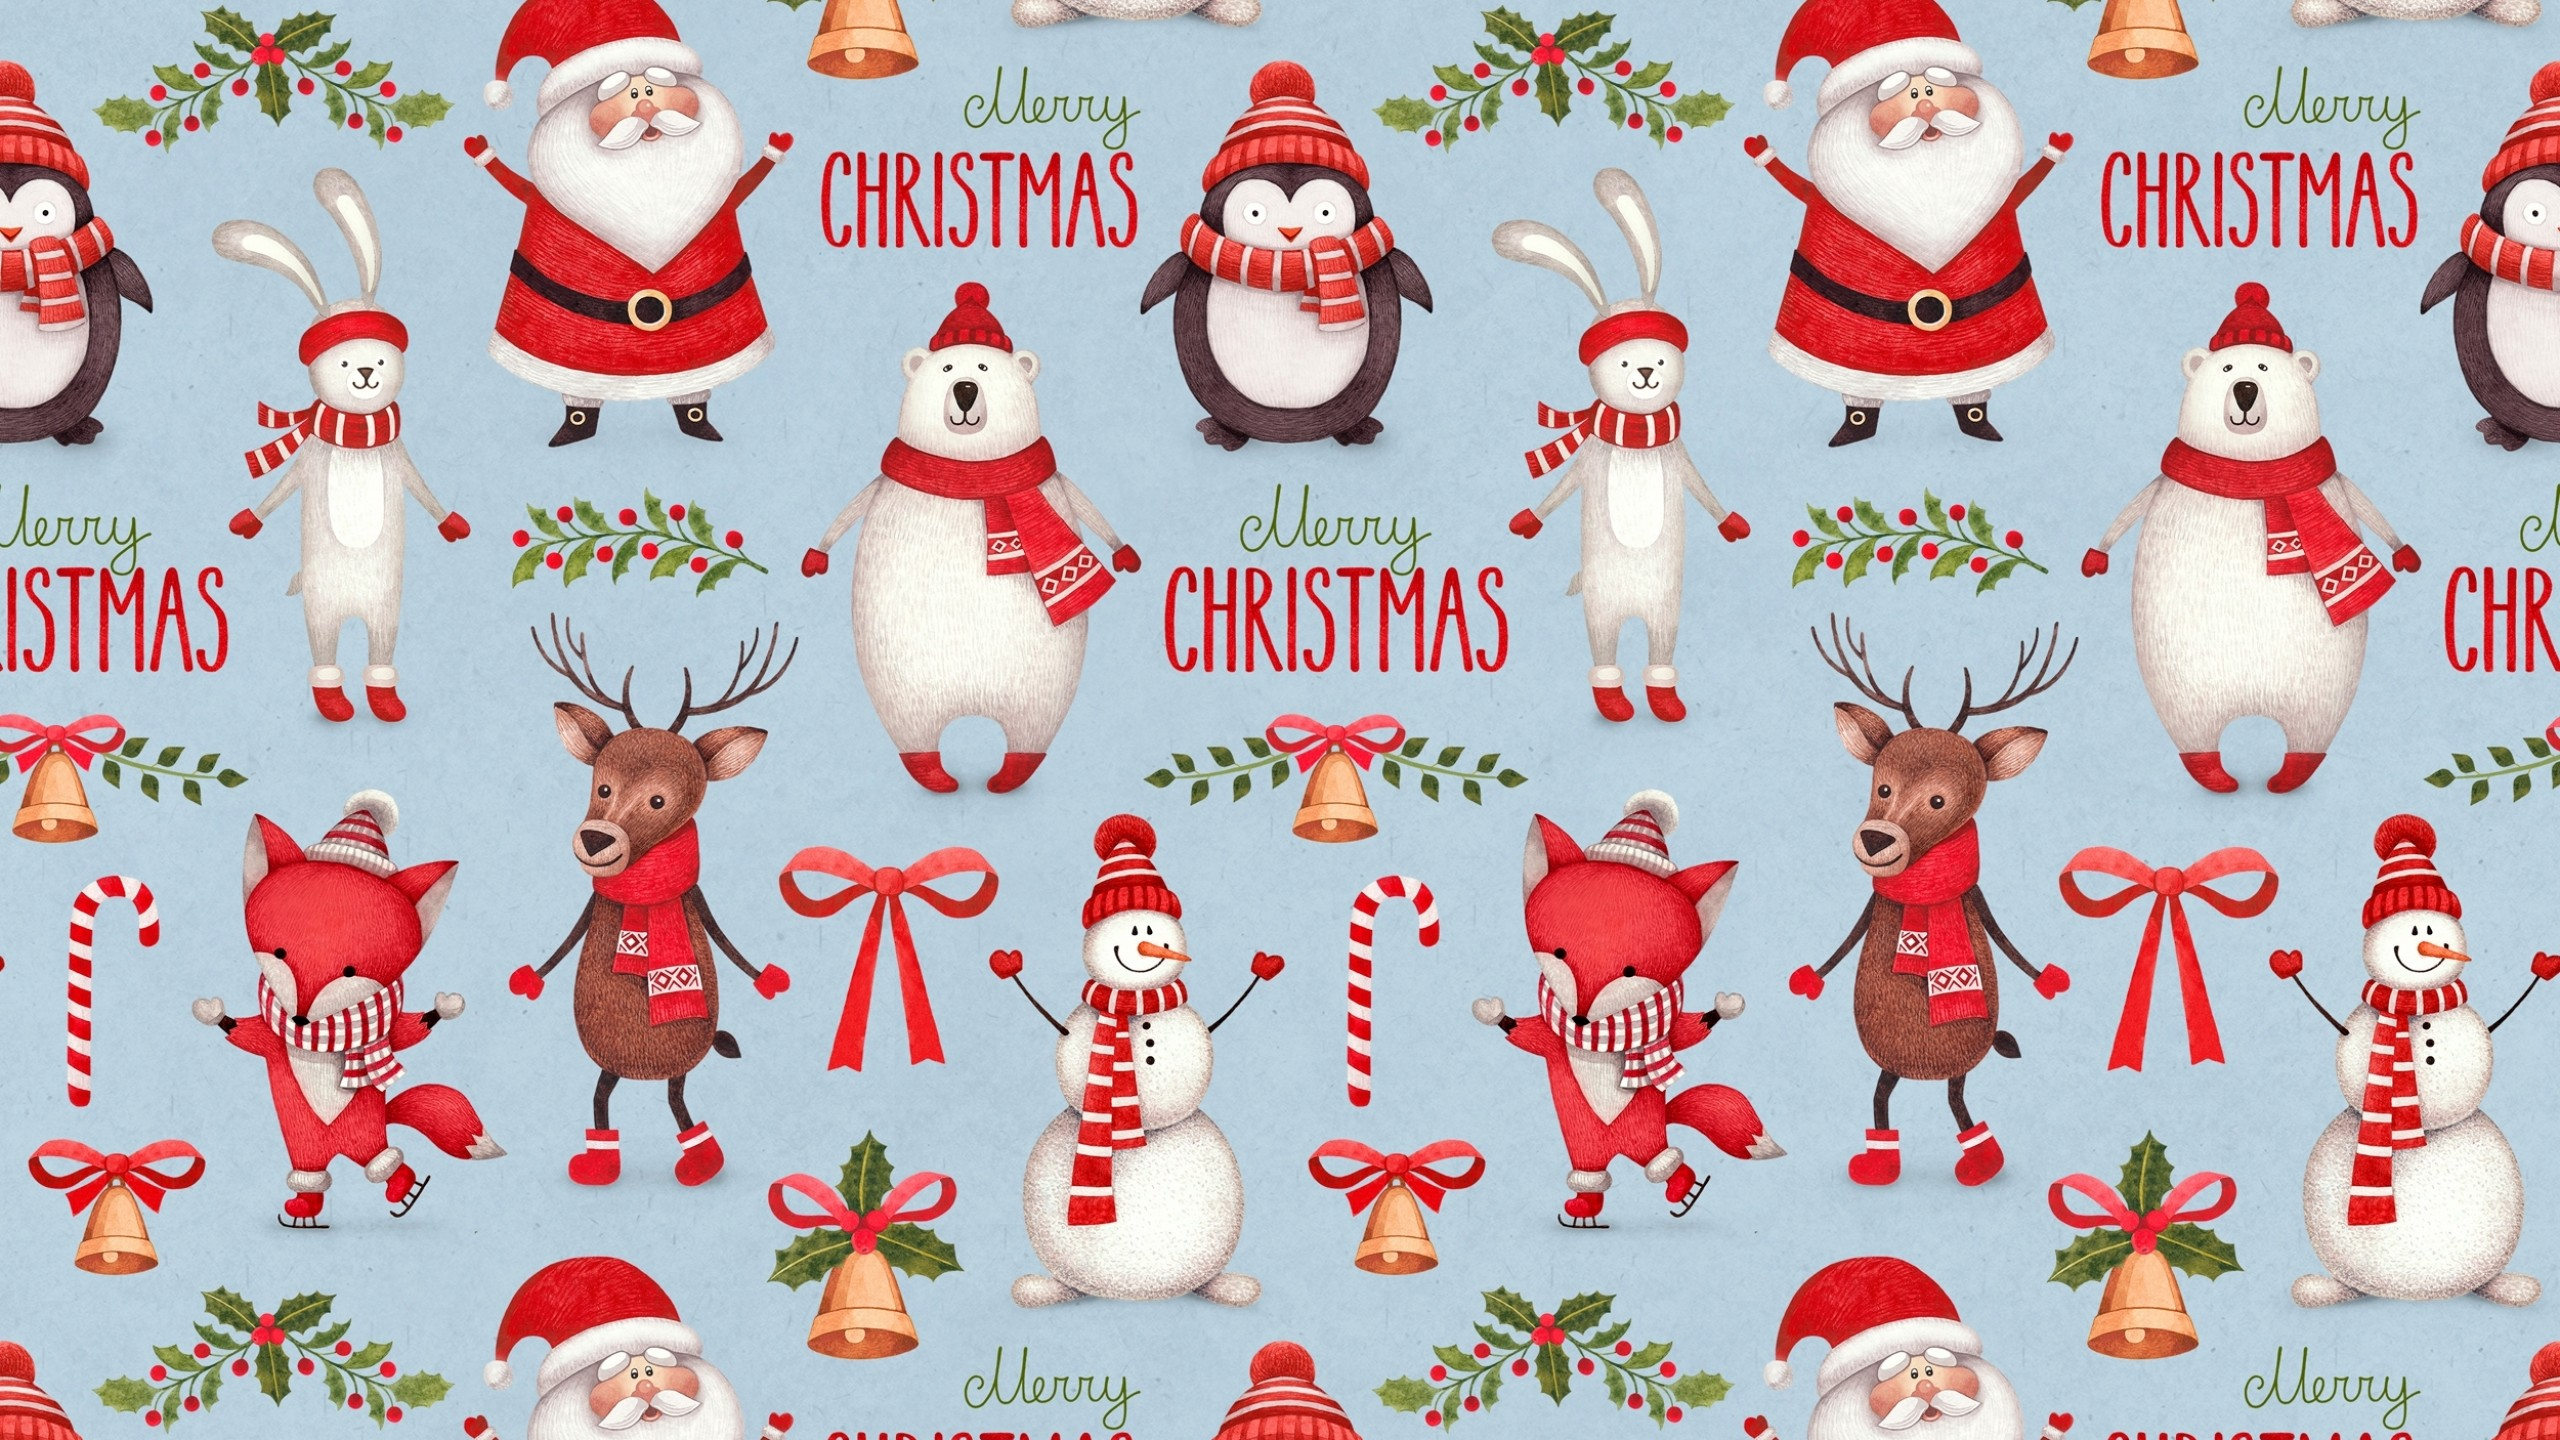 10 Best Uhd 4k Christmas Wallpapers 2017 Axeenow